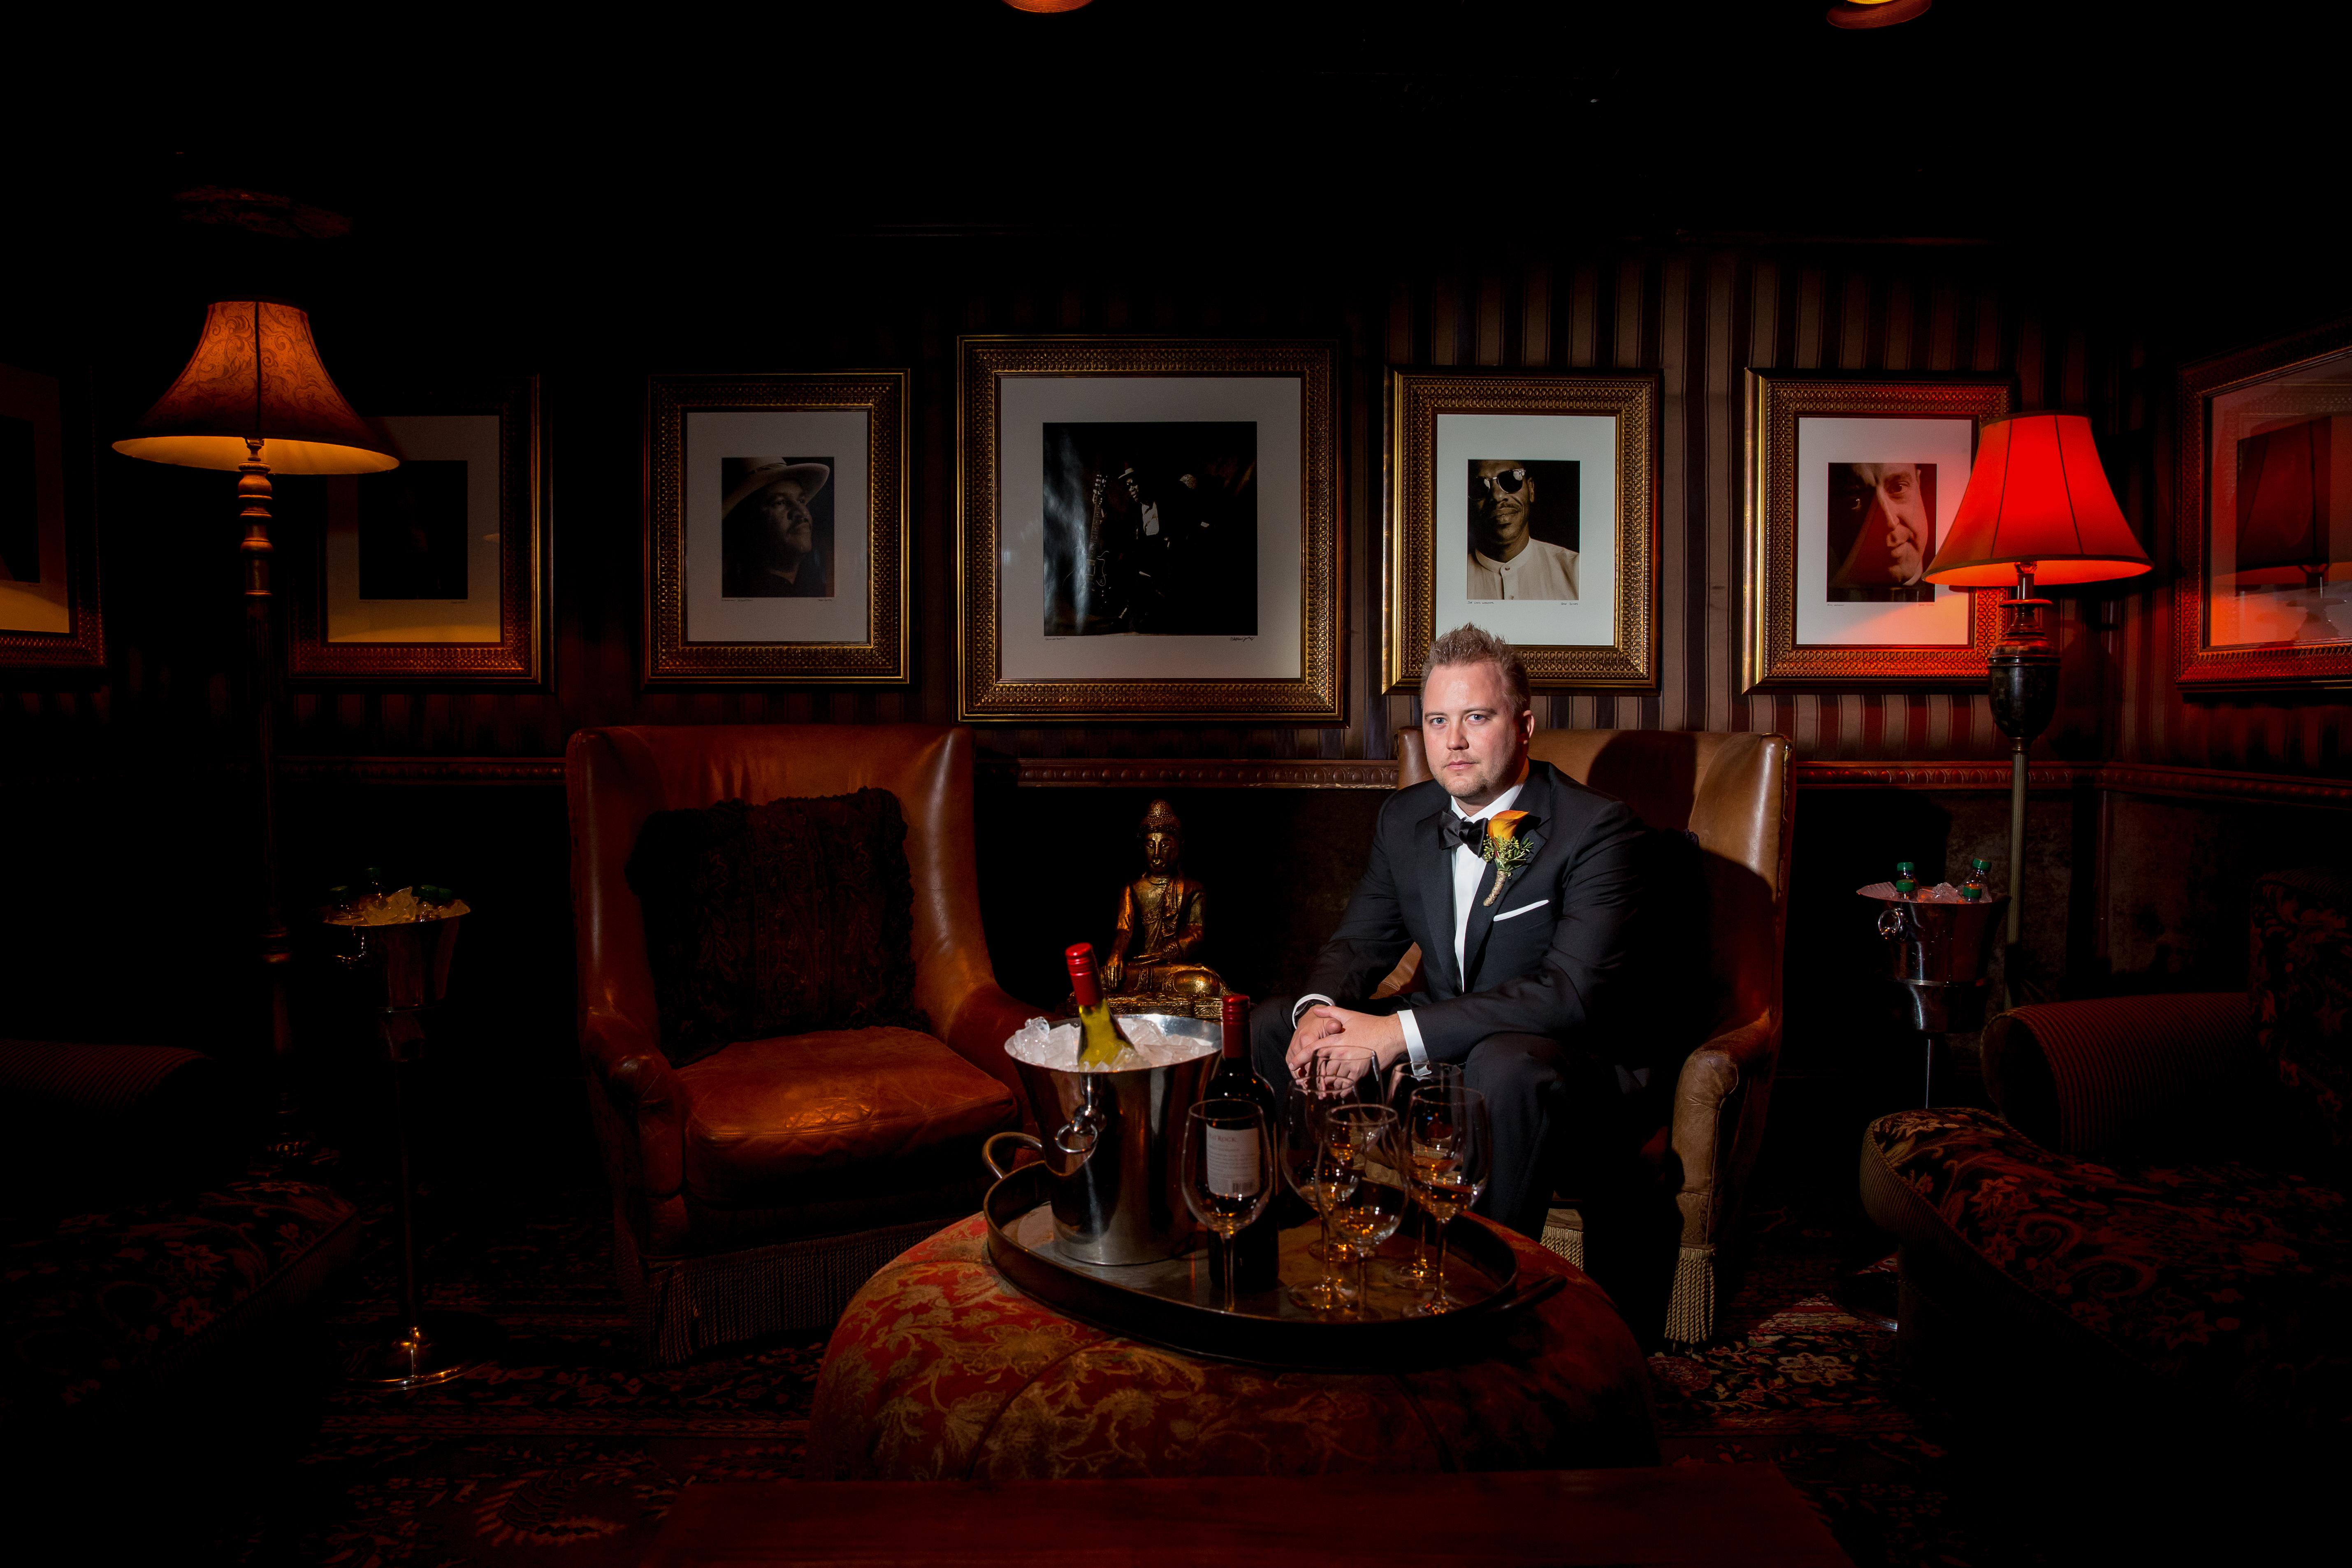 Groom Portrait: Lounge with Celebrity Photos